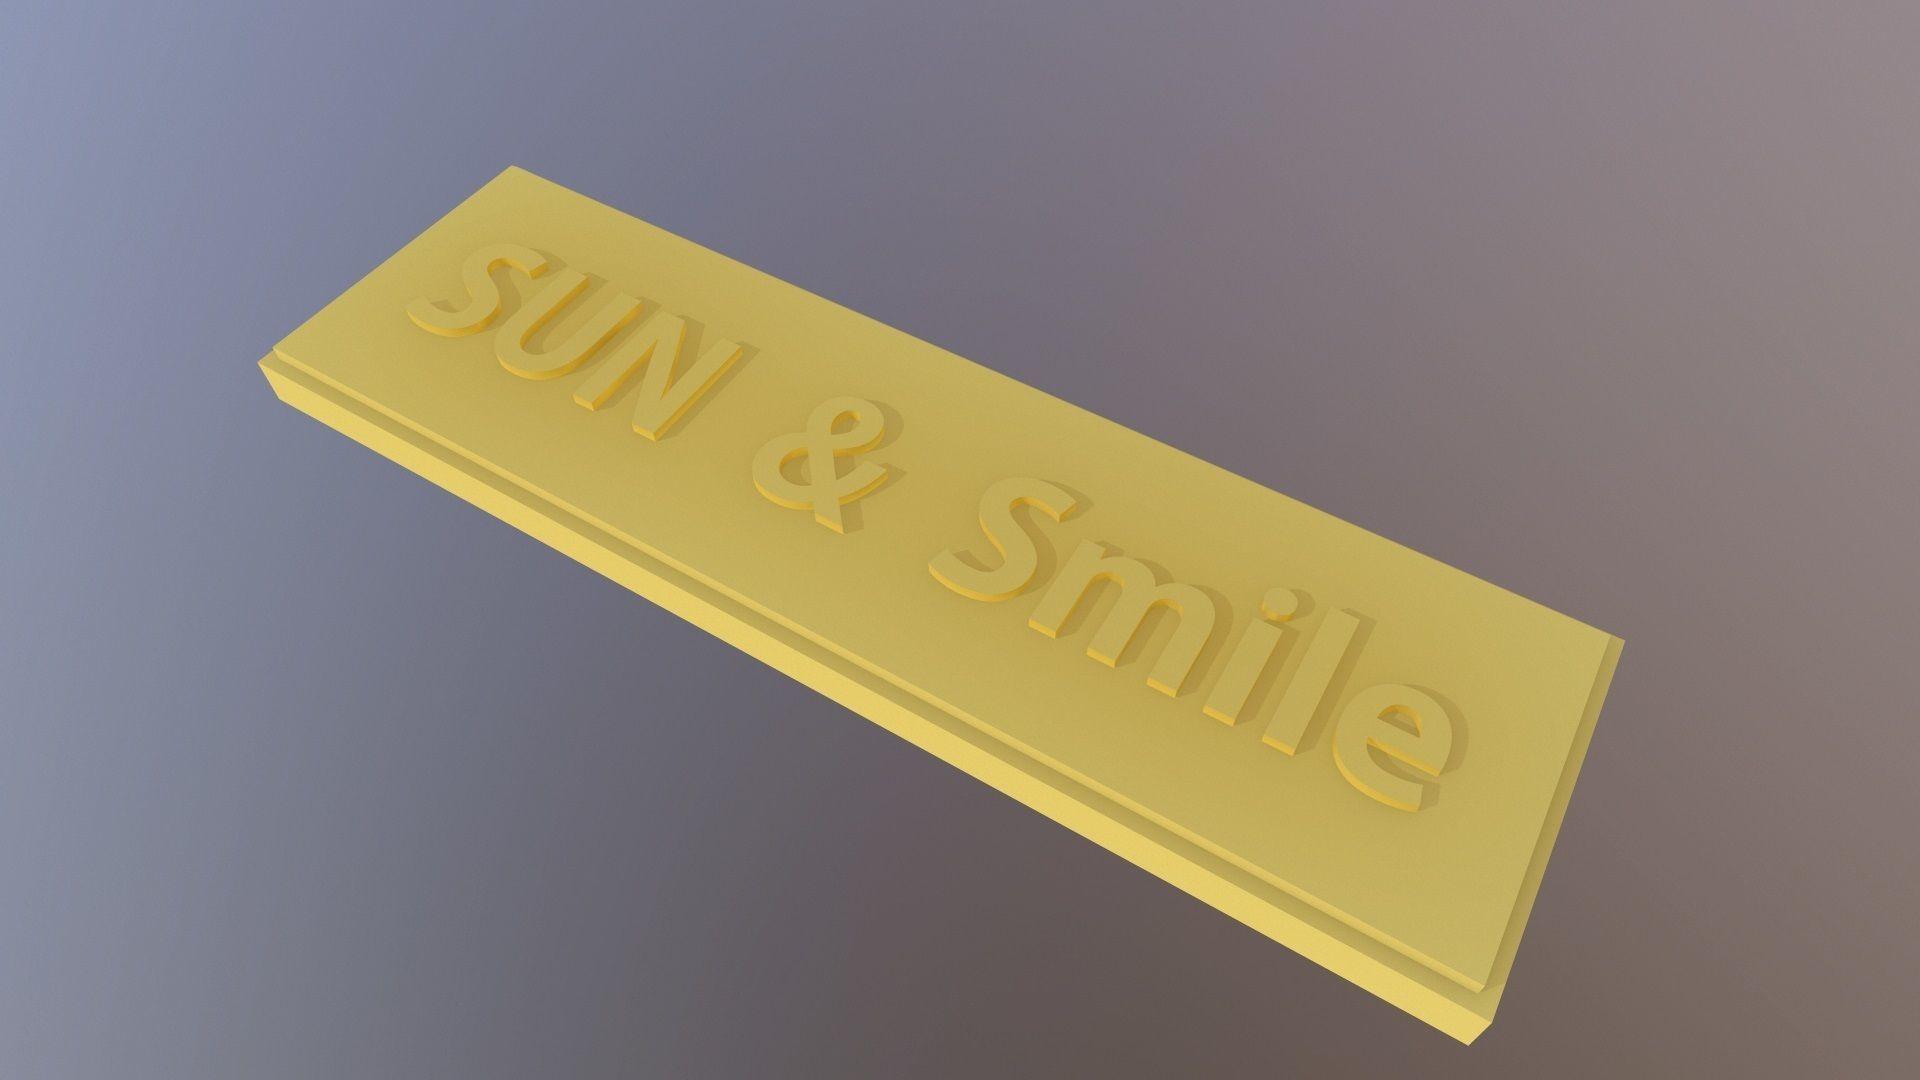 SUN and smile label